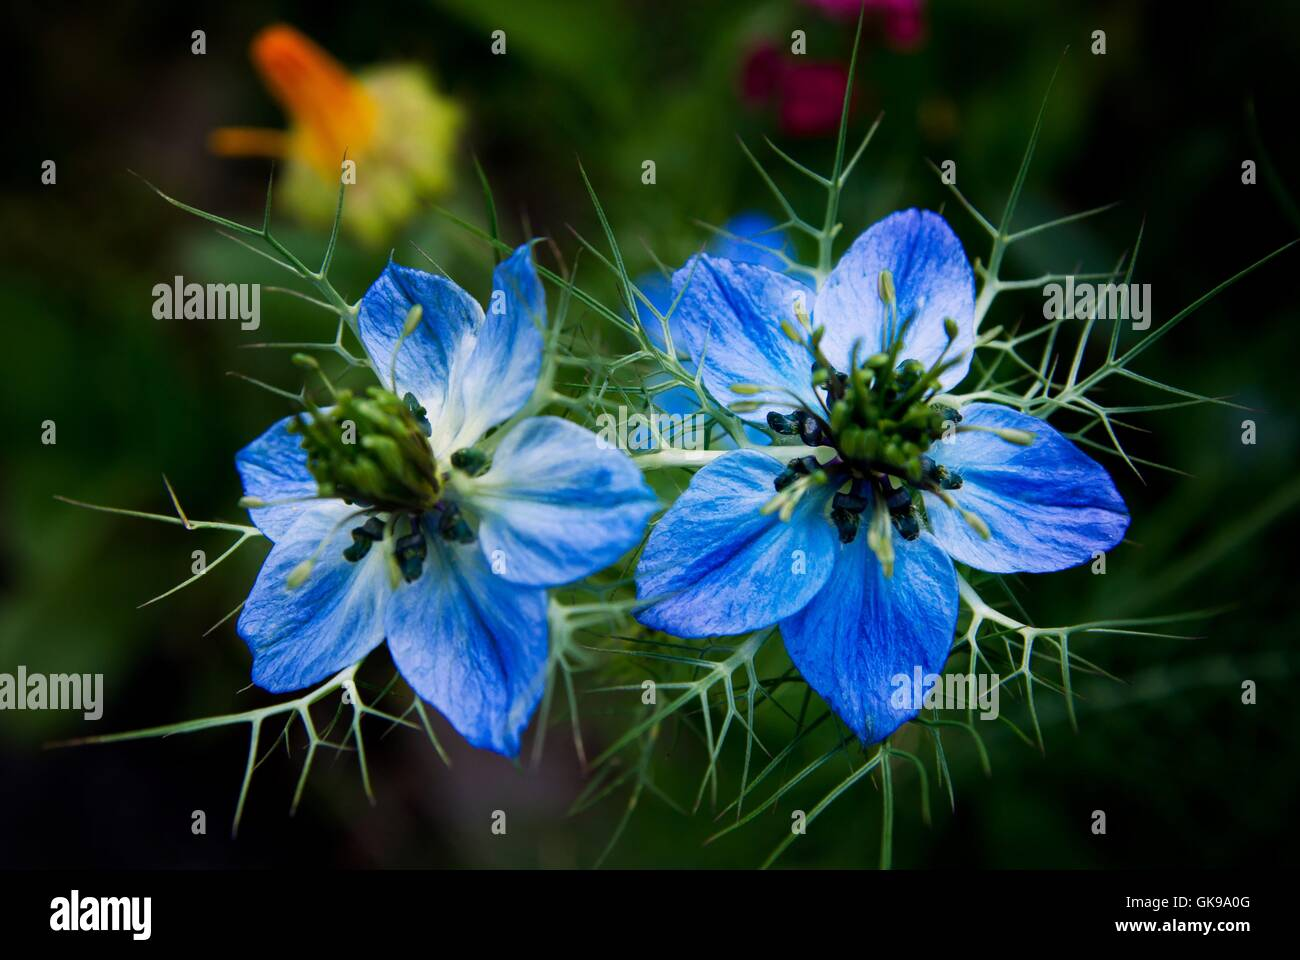 Black Cumin Flower Stock Photos & Black Cumin Flower Stock Images ...